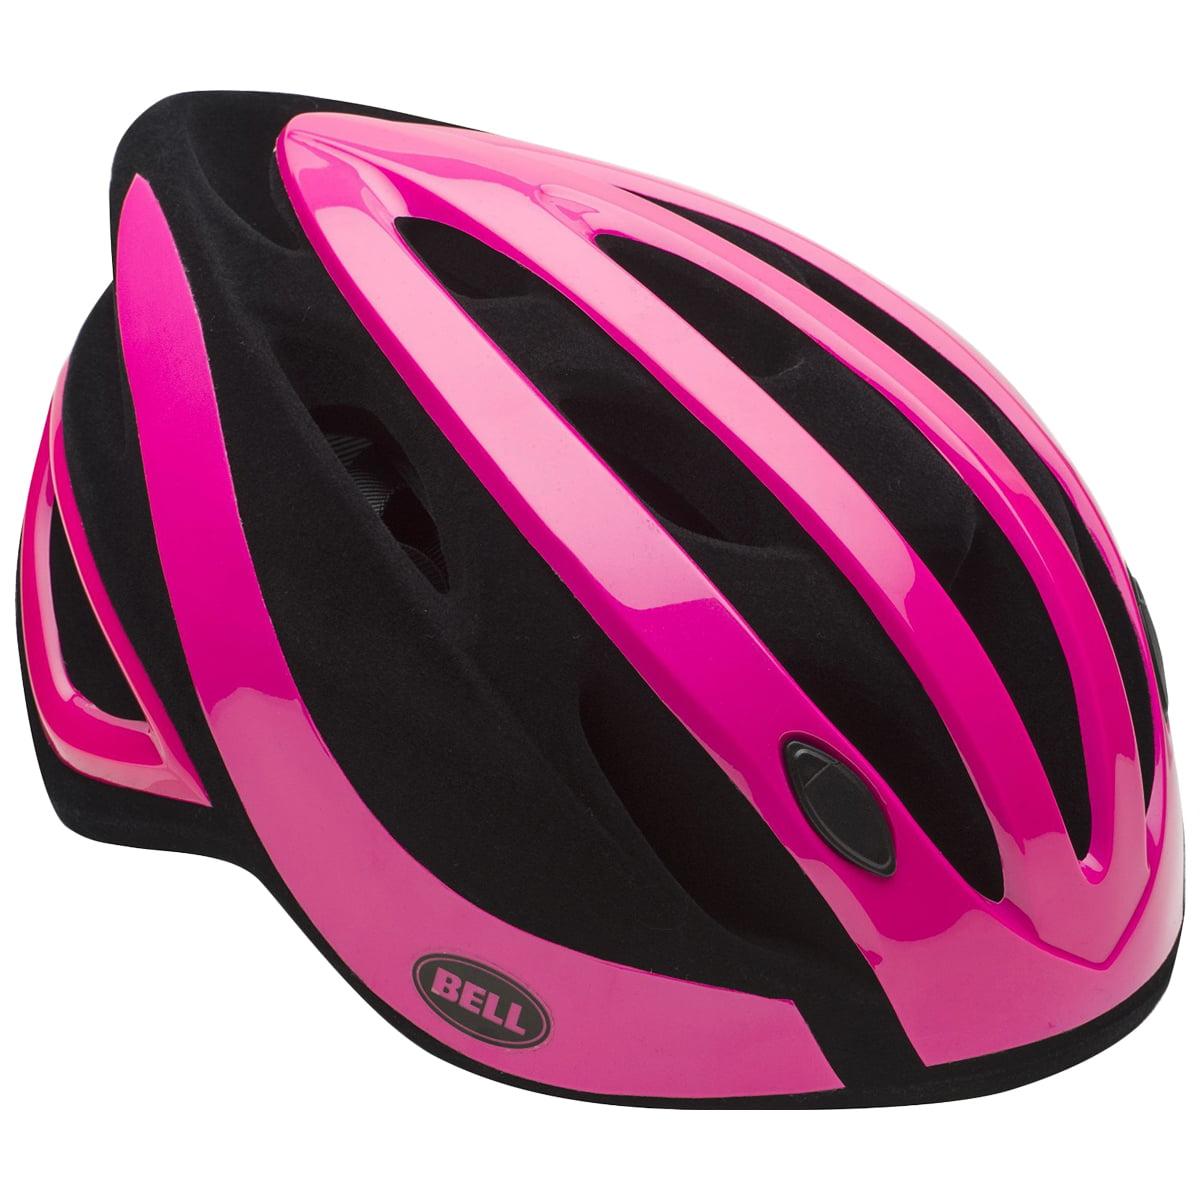 Bell Sports Impel Adult Bicycle Helmet Lightweight Adjustable Vents Street Bike